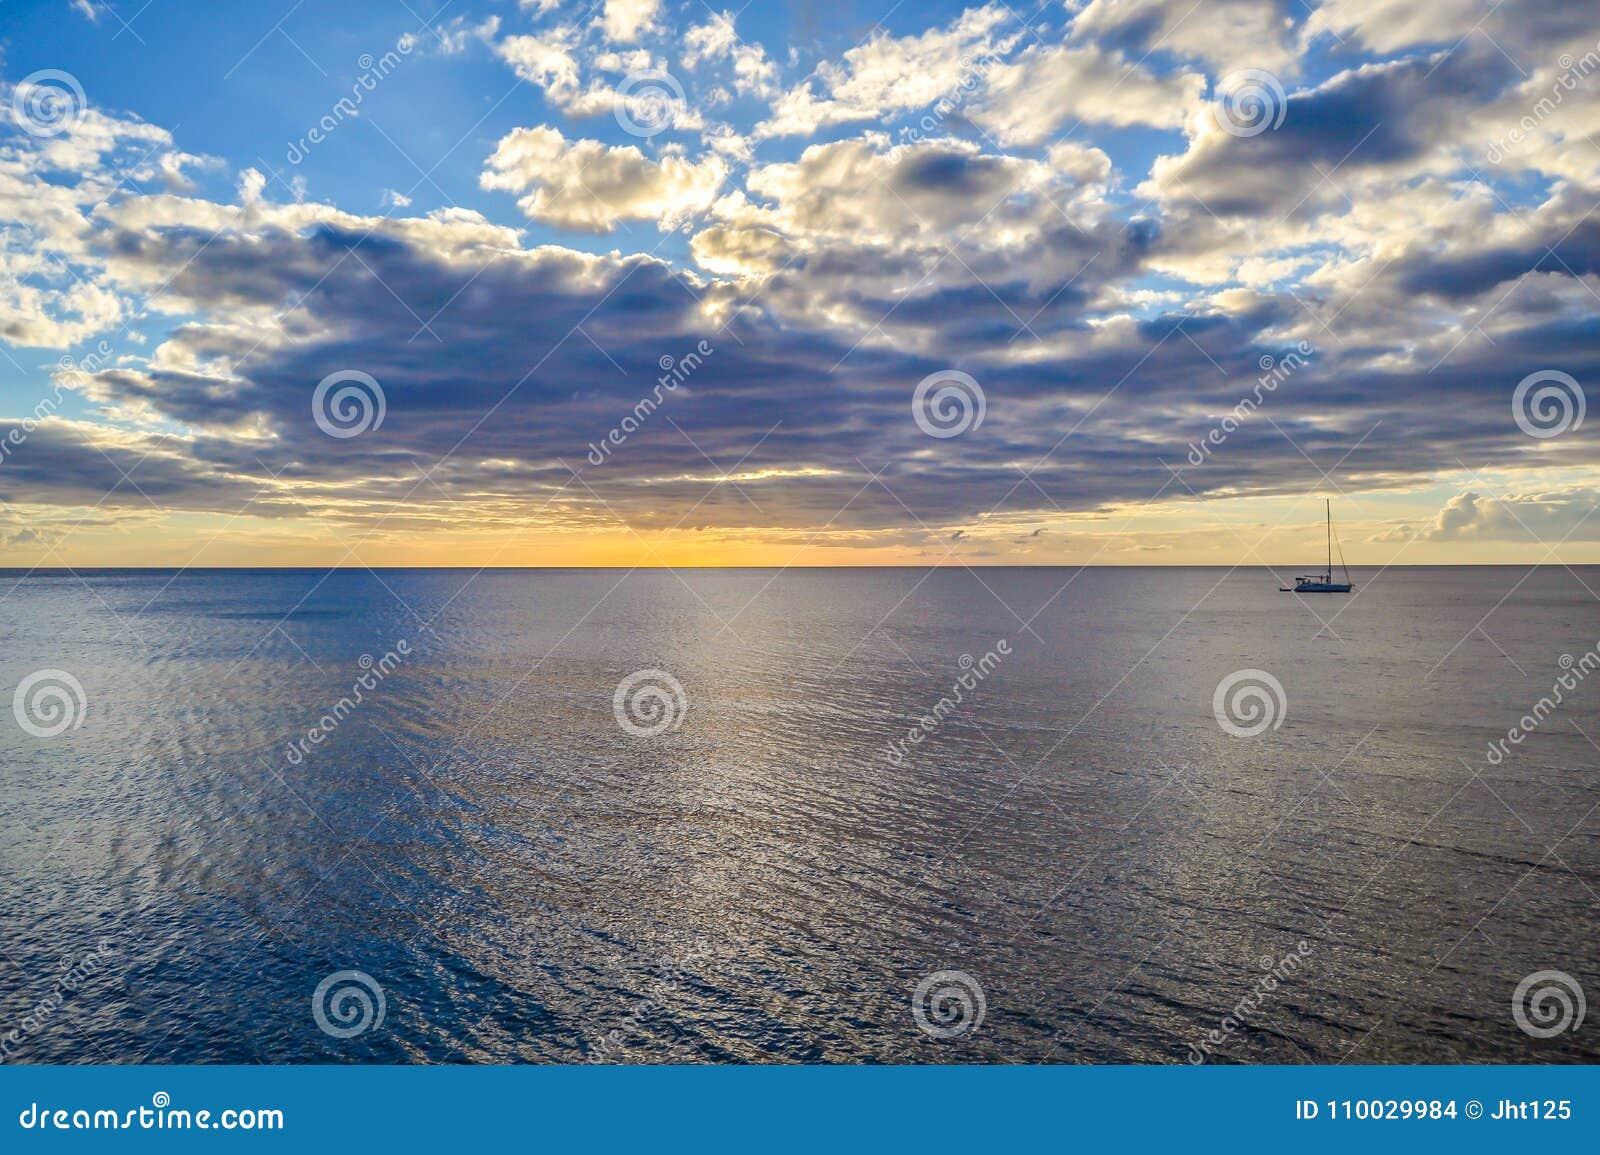 Dominica Island Sunset in Silhouet